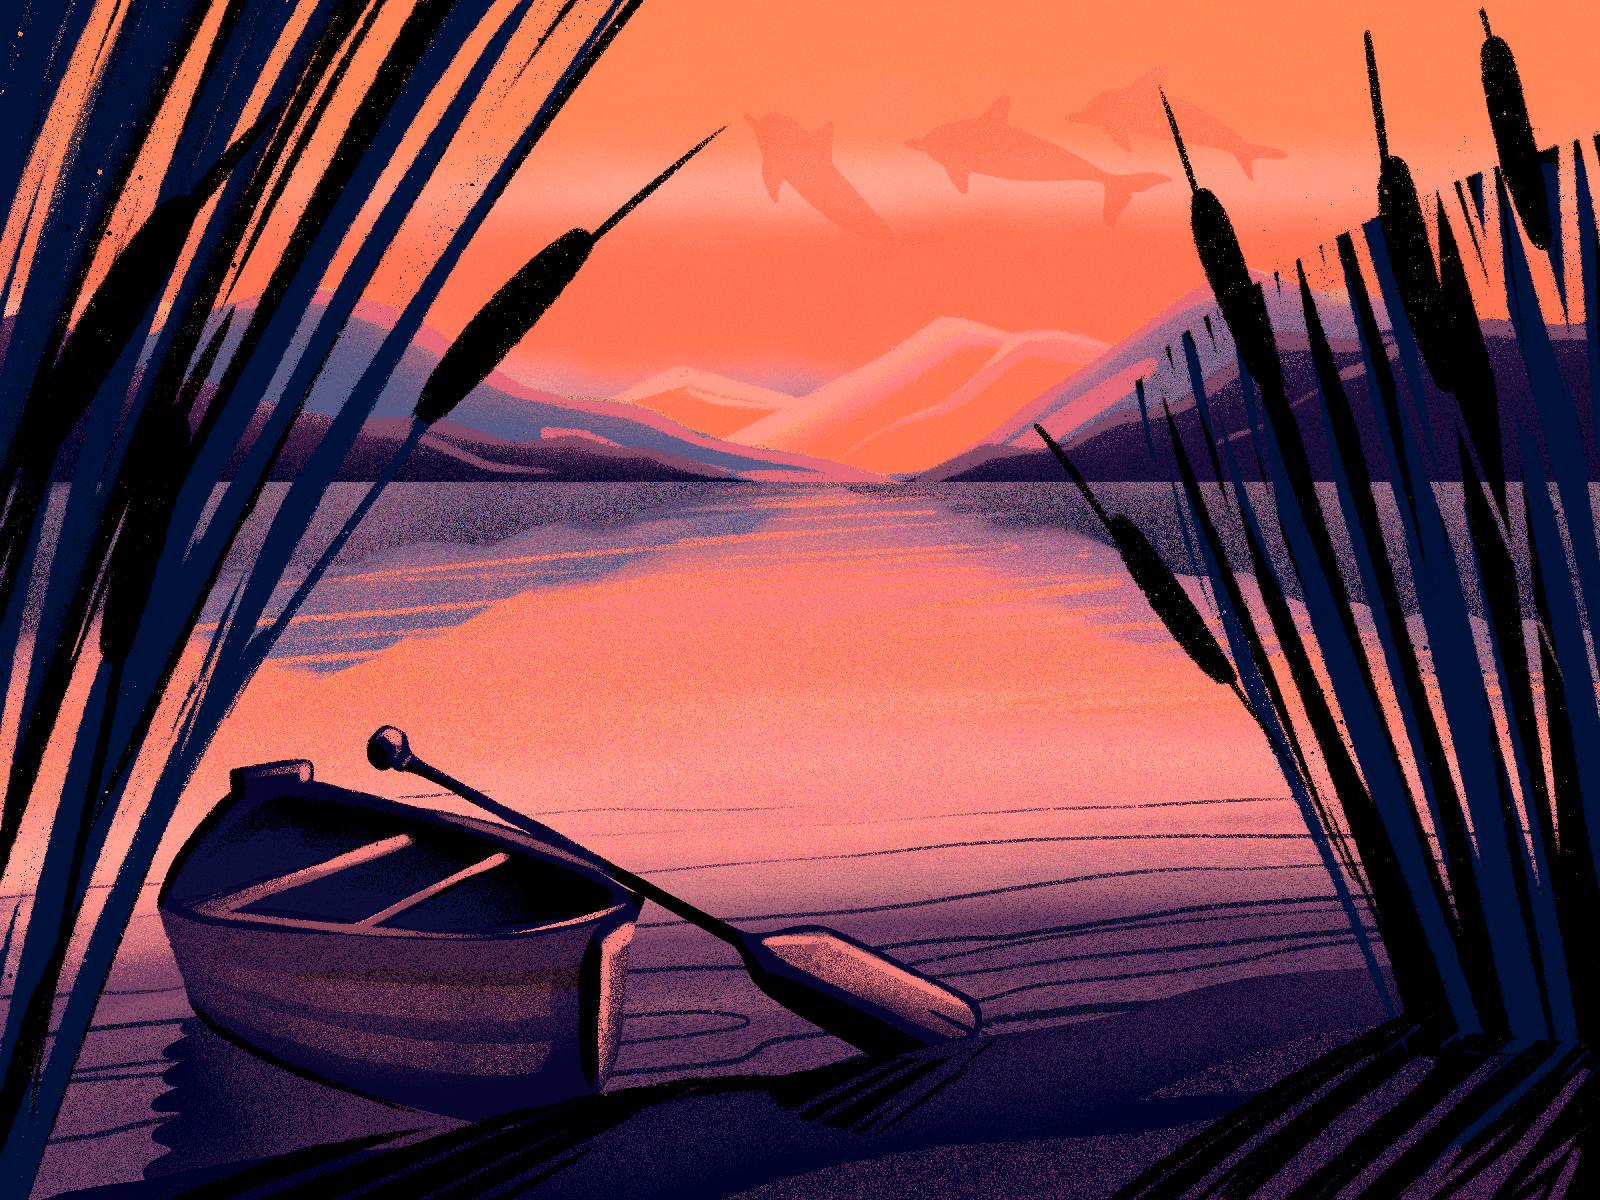 sunset river illustration